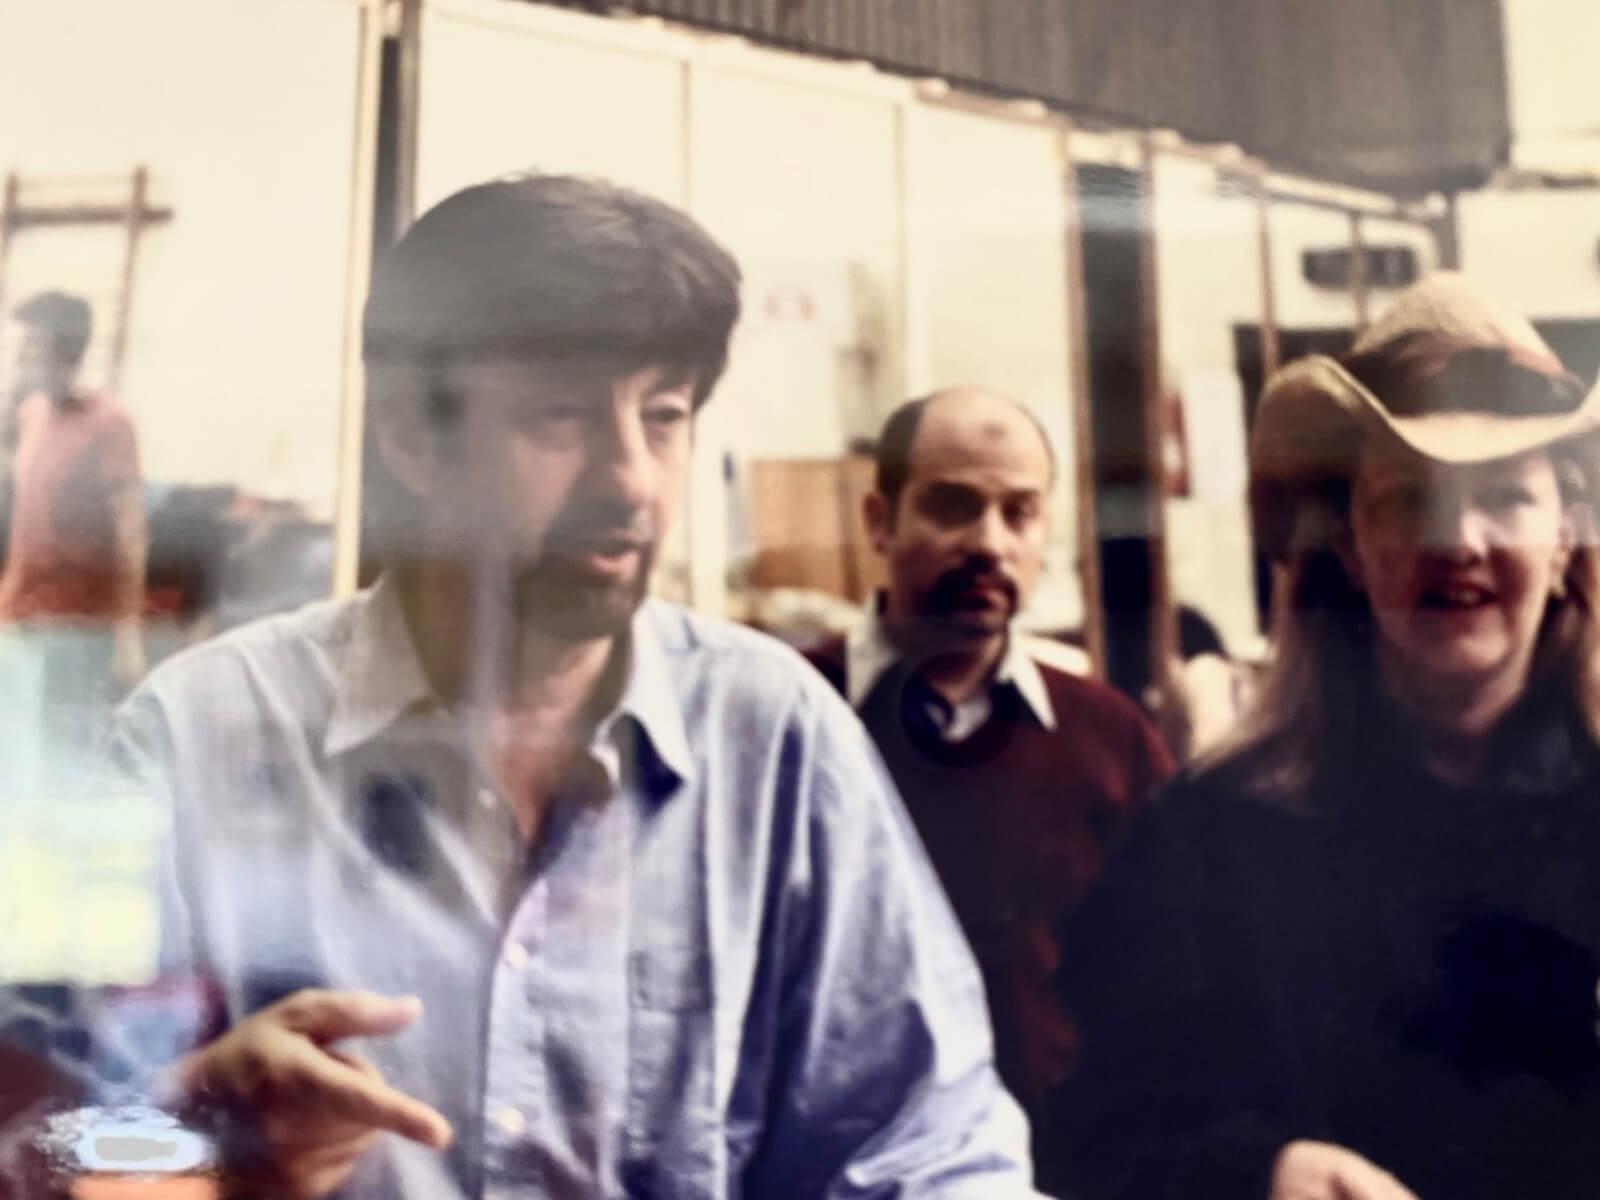 Director Trevor Nunn, Dance Arranger David Krane and Choreographer Susan Stroman rehearsing for the West End production of Oklahoma.